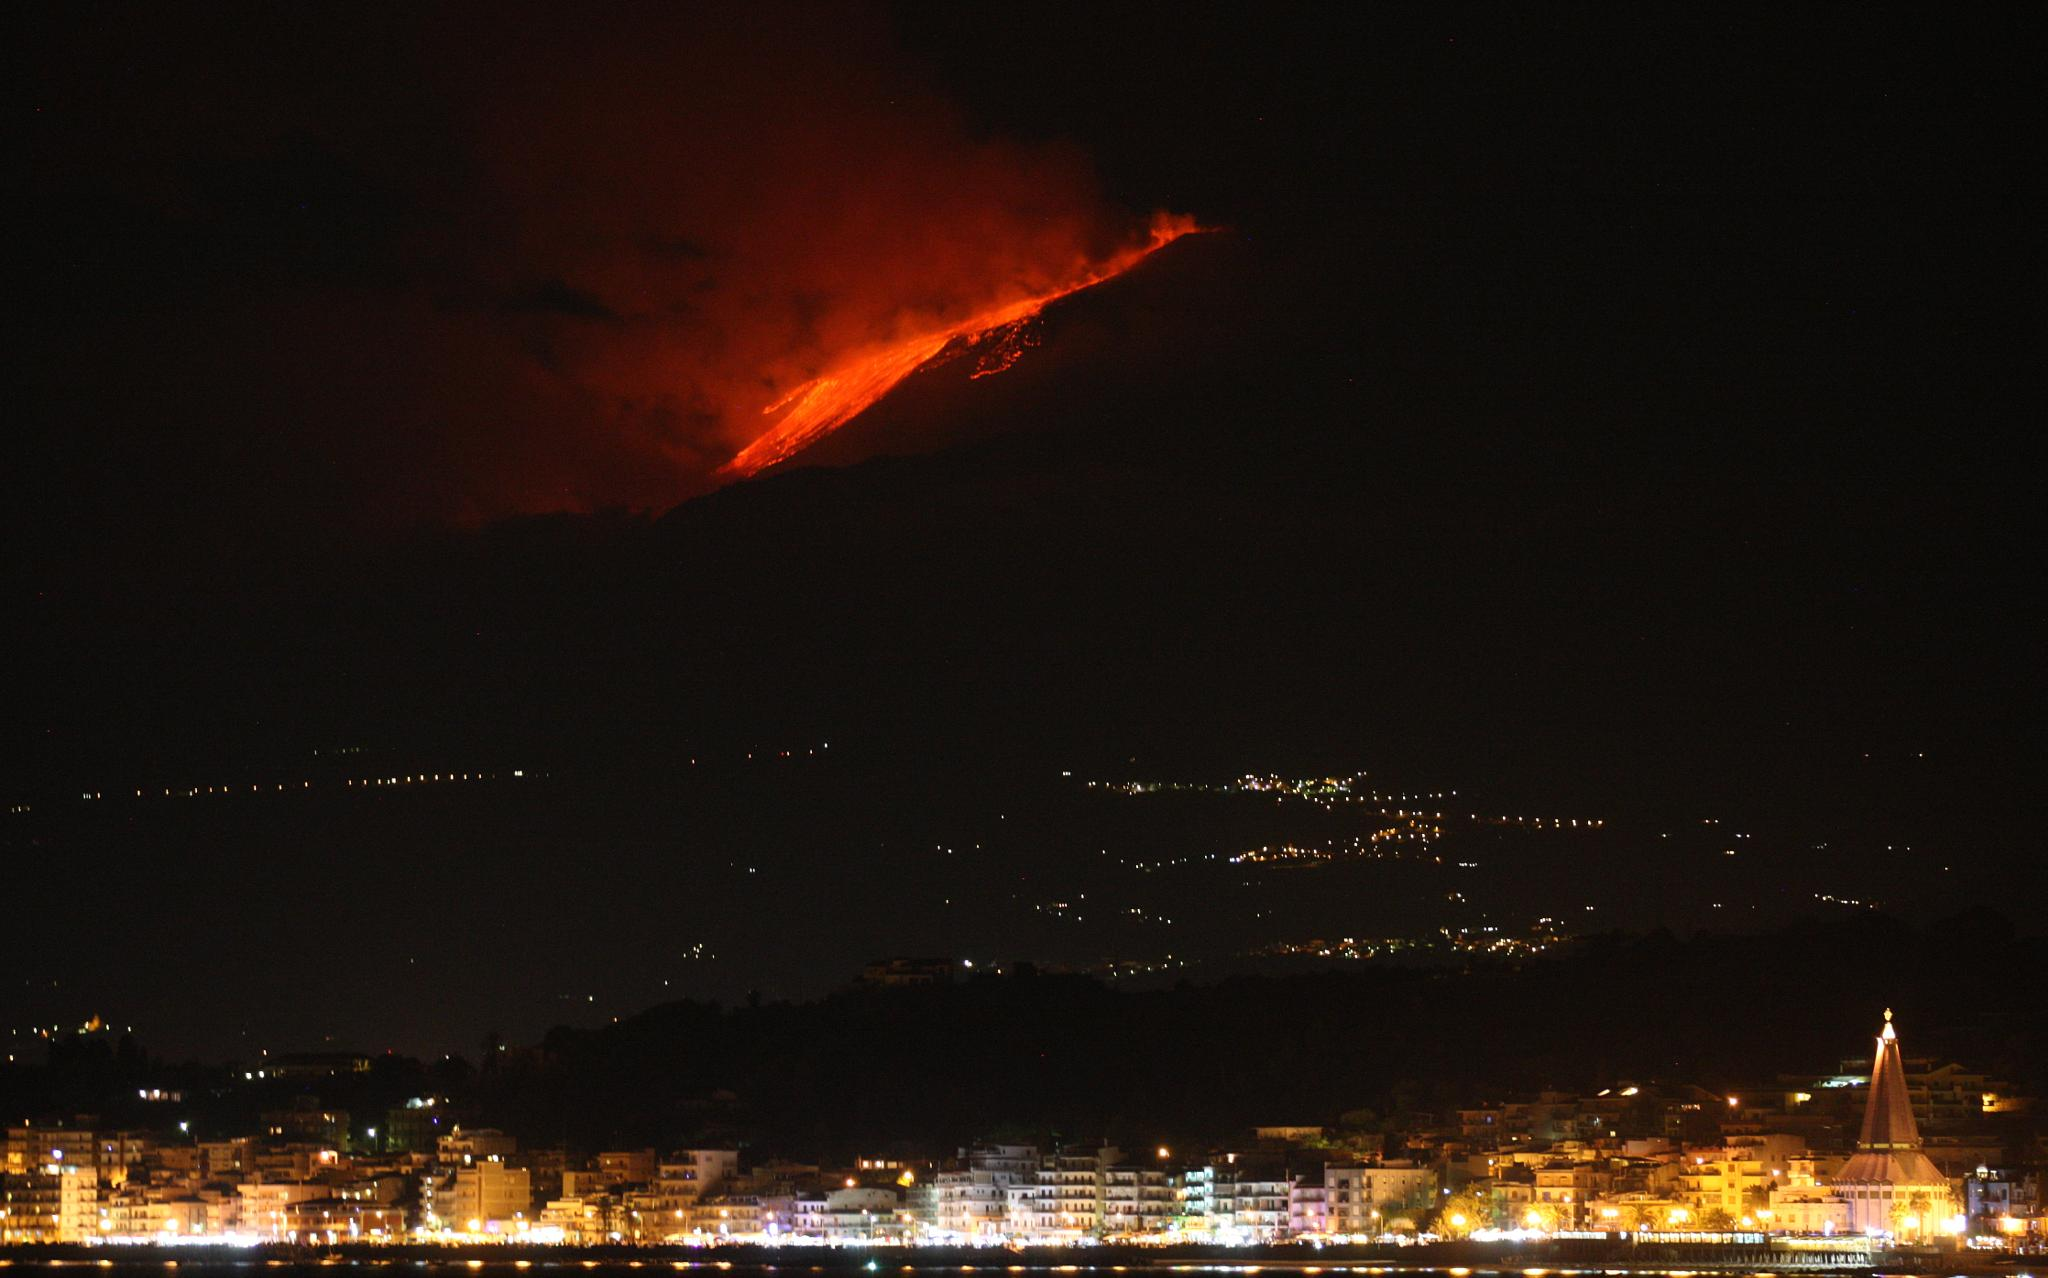 Etna at Night by Mark Rupert